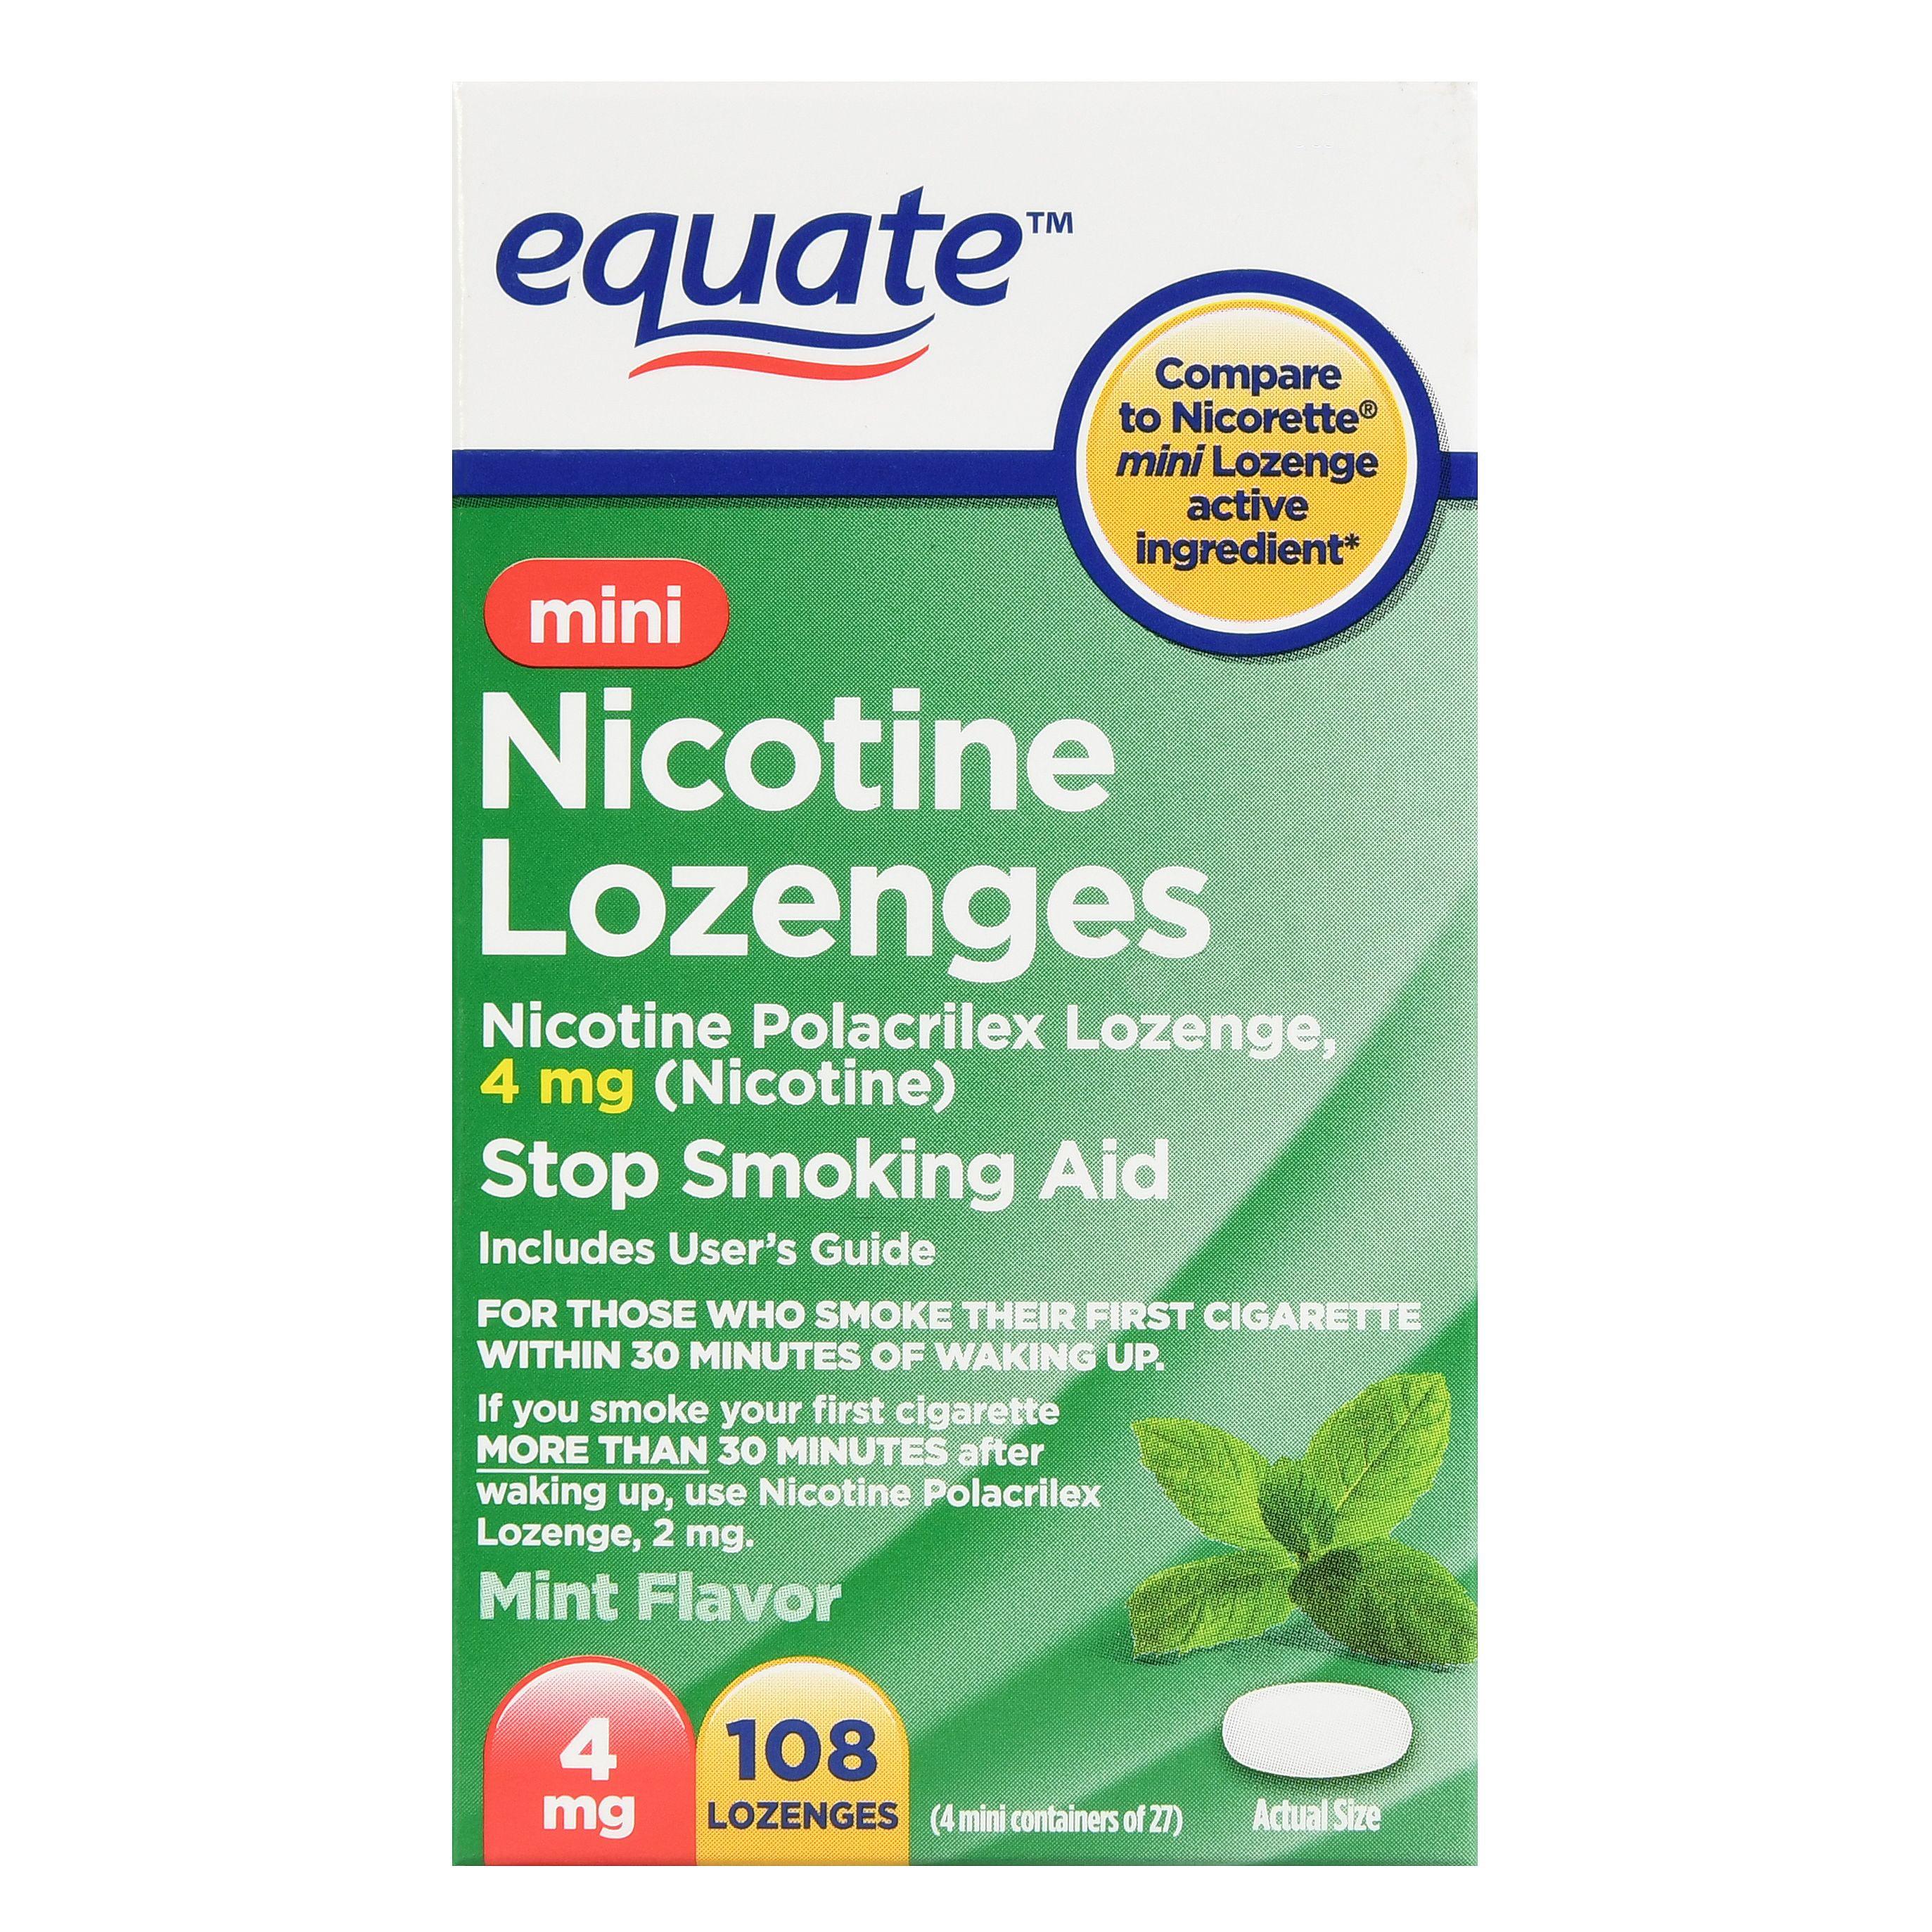 Equate Mini Nicotine Lozenges, Mint Flavor, 4 mg, 108 Count